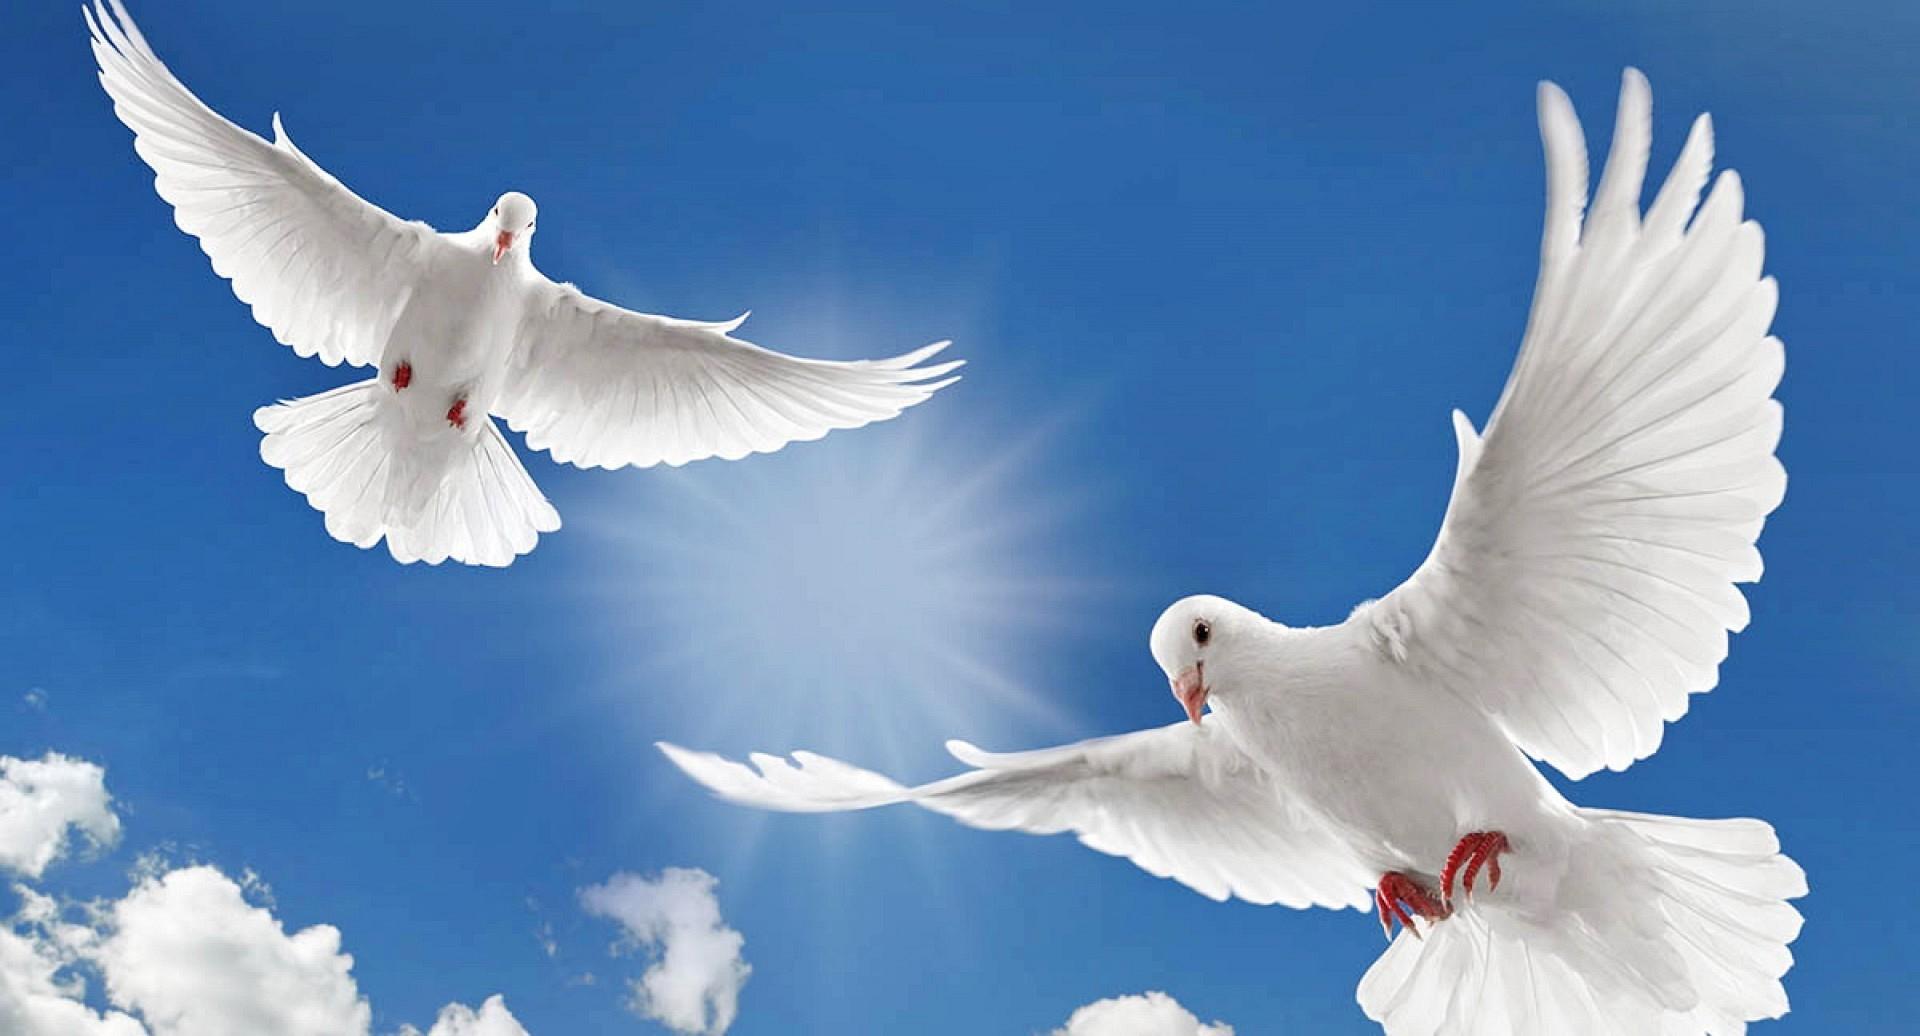 Картинки Мир за мир во всем мире   подборка фото (15)